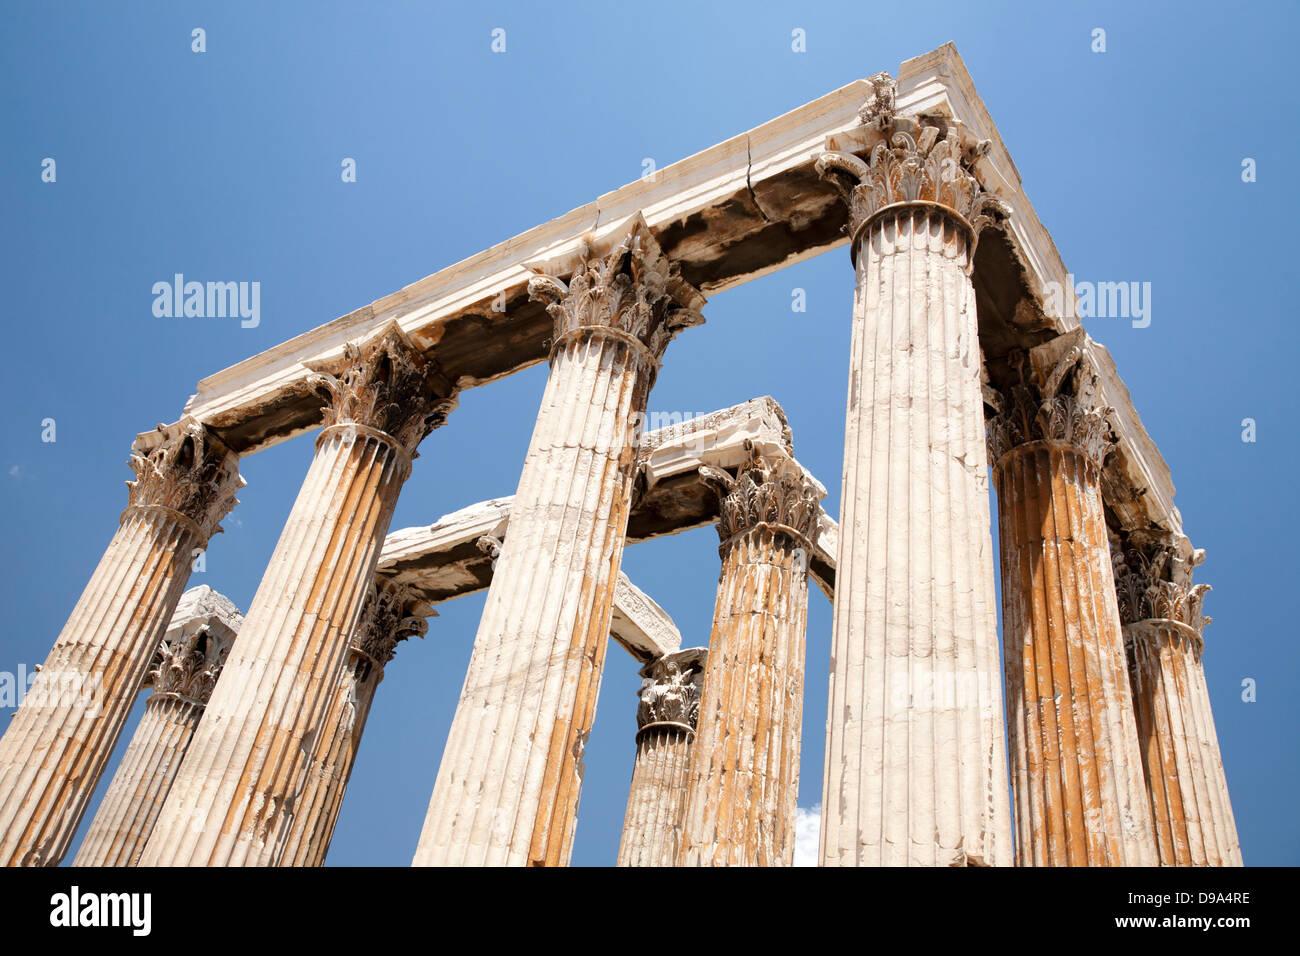 Temple of Olympian Zeus - Stock Image